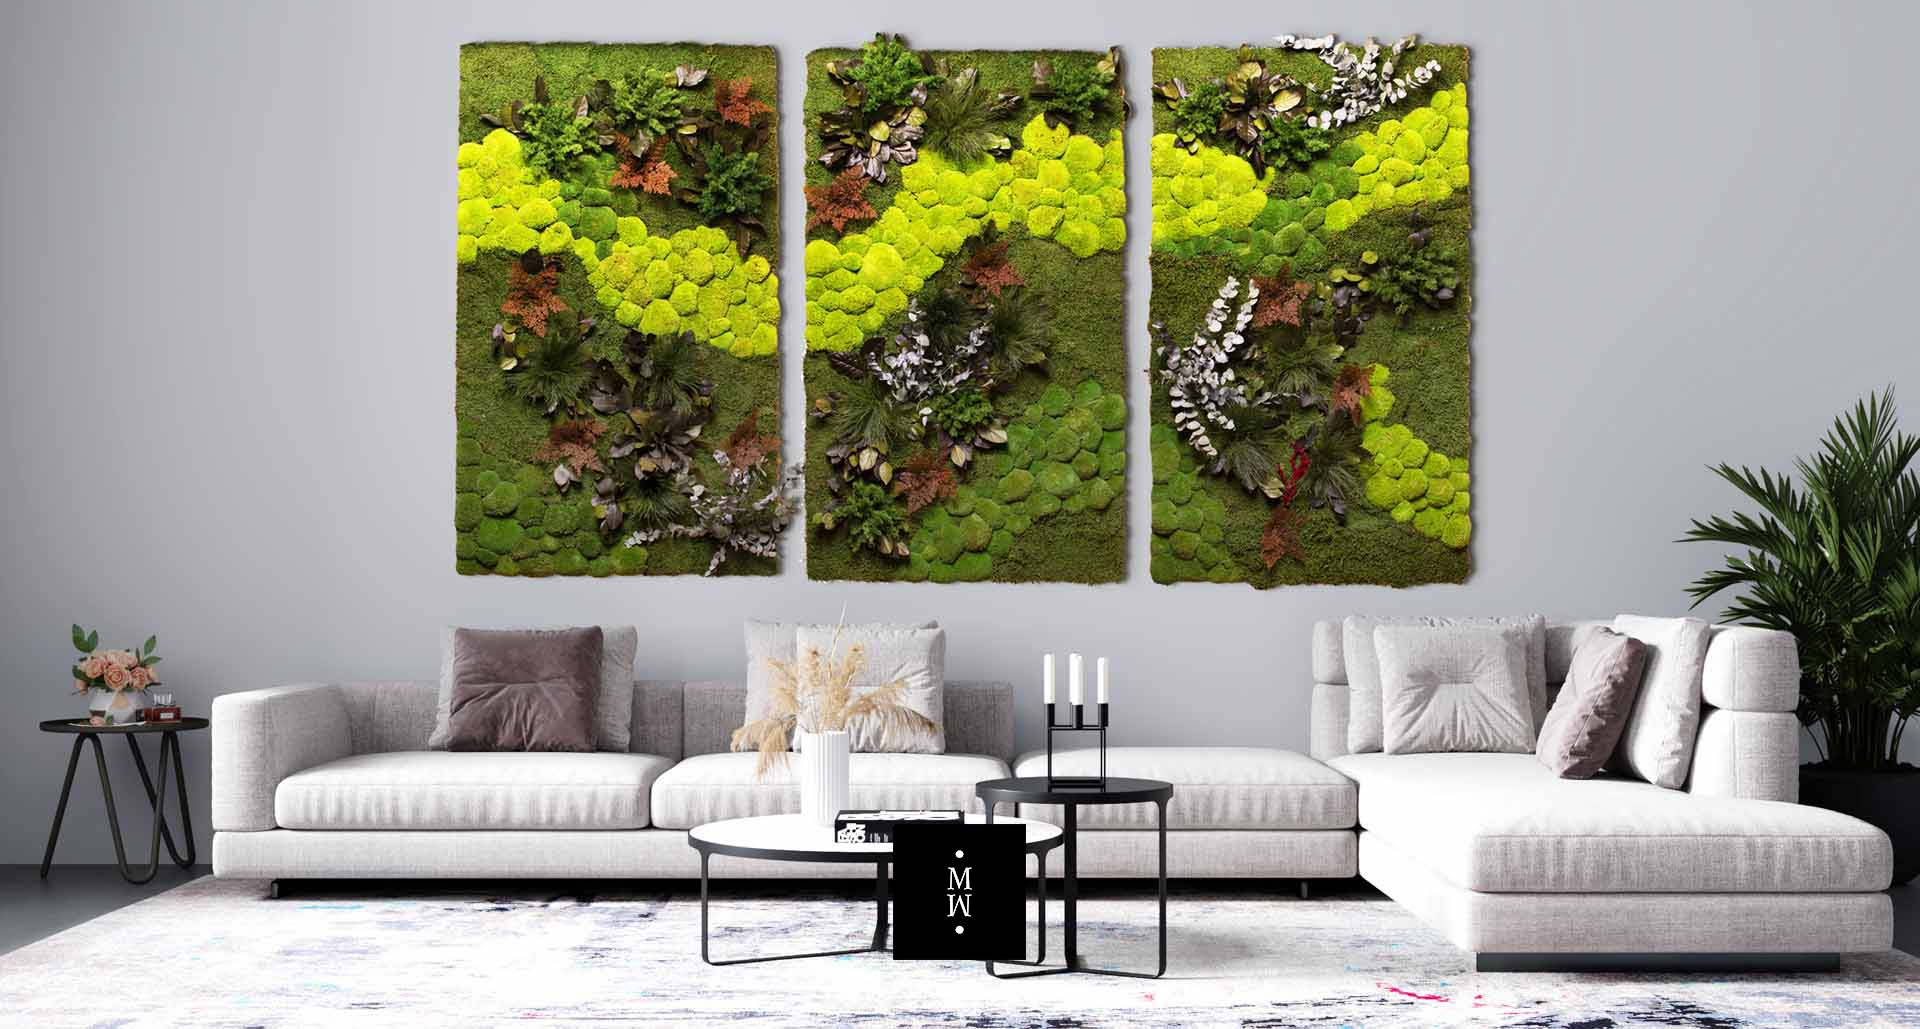 Moosbild 3er Kombination Central Park Waldmoos Ballenmoos Pflanzenelemente